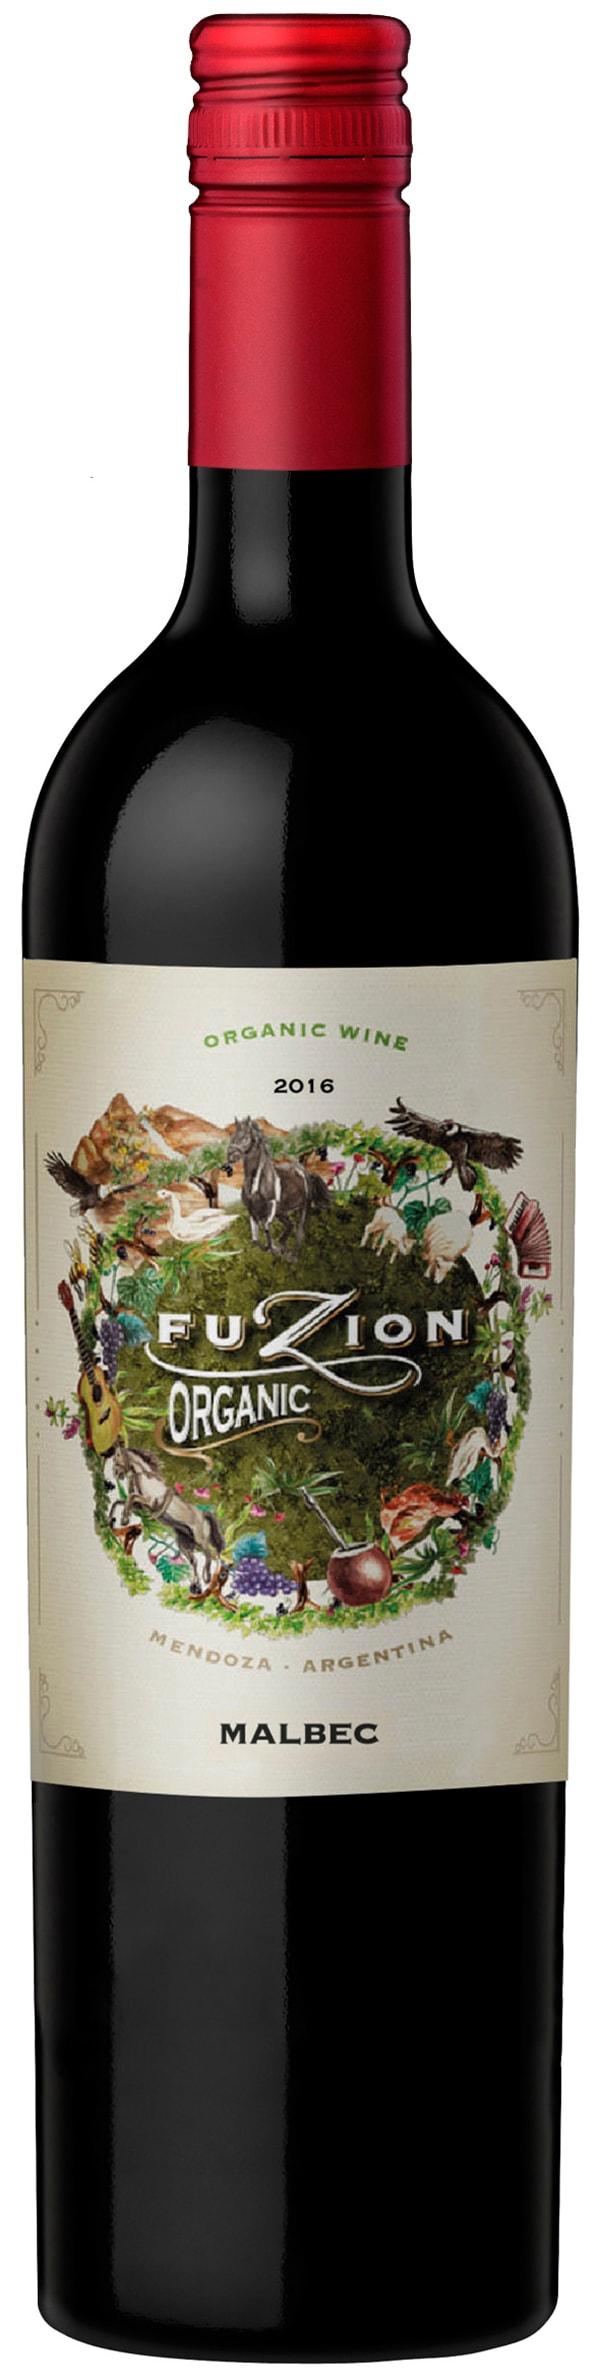 Fuzion Organic Malbec 2019